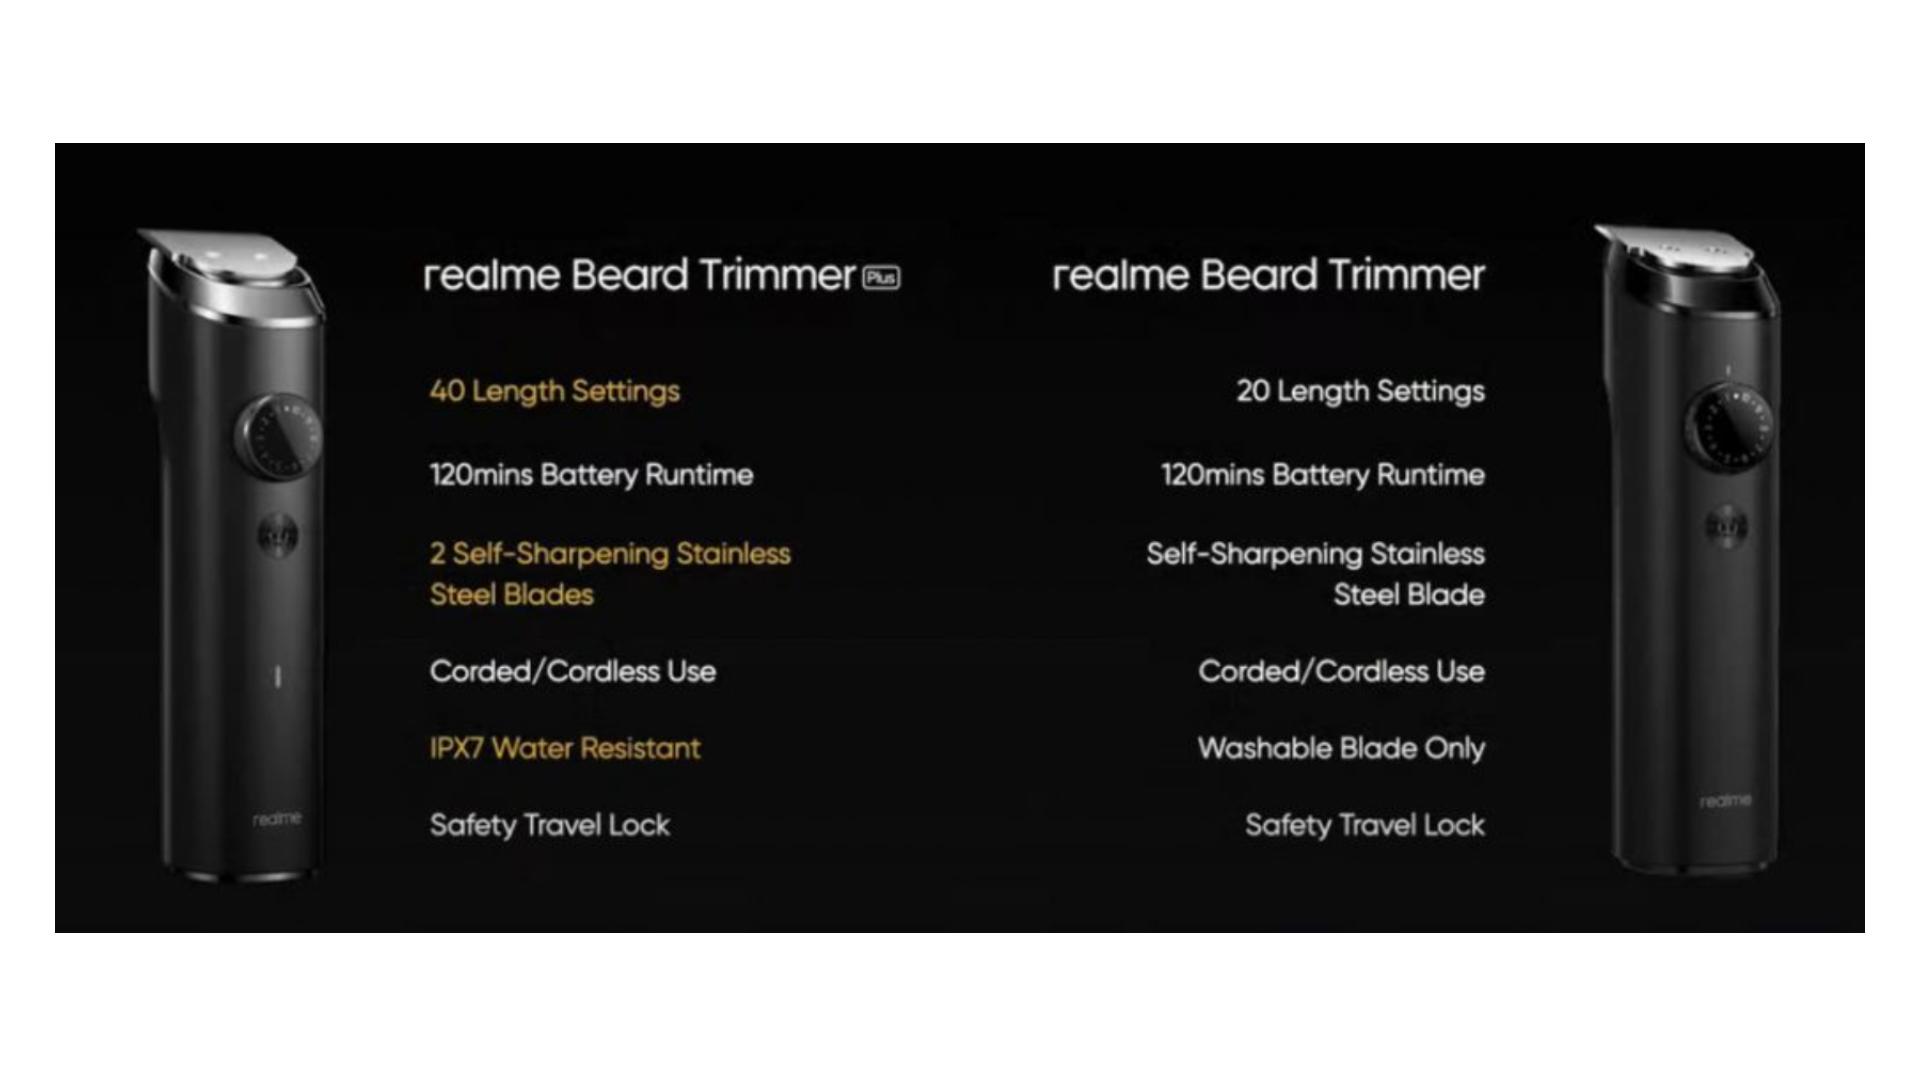 Realme Beard Trimmer, Beard Trimmer Plus Features